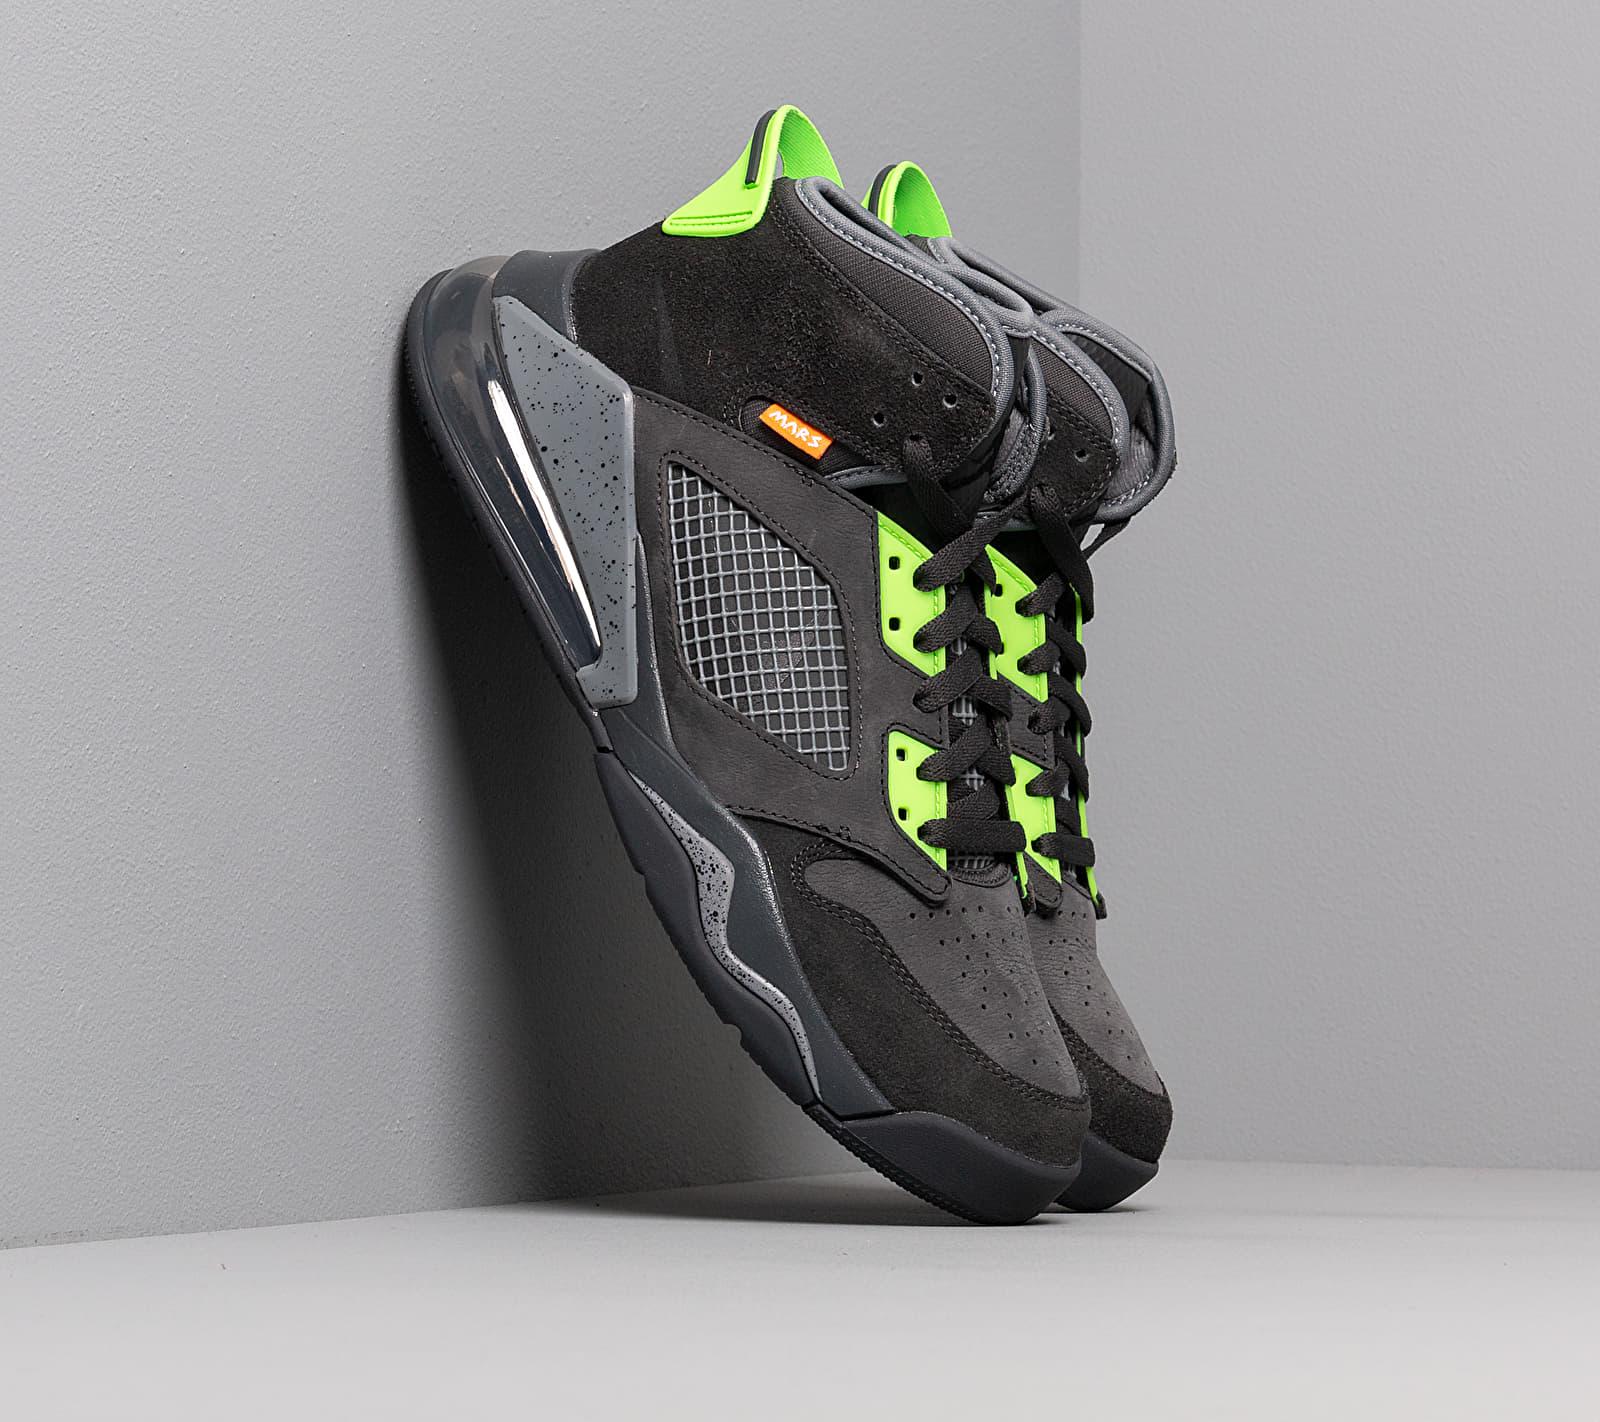 Jordan Mars 270 Anthracite/ Black-Electric Green CT9132-001